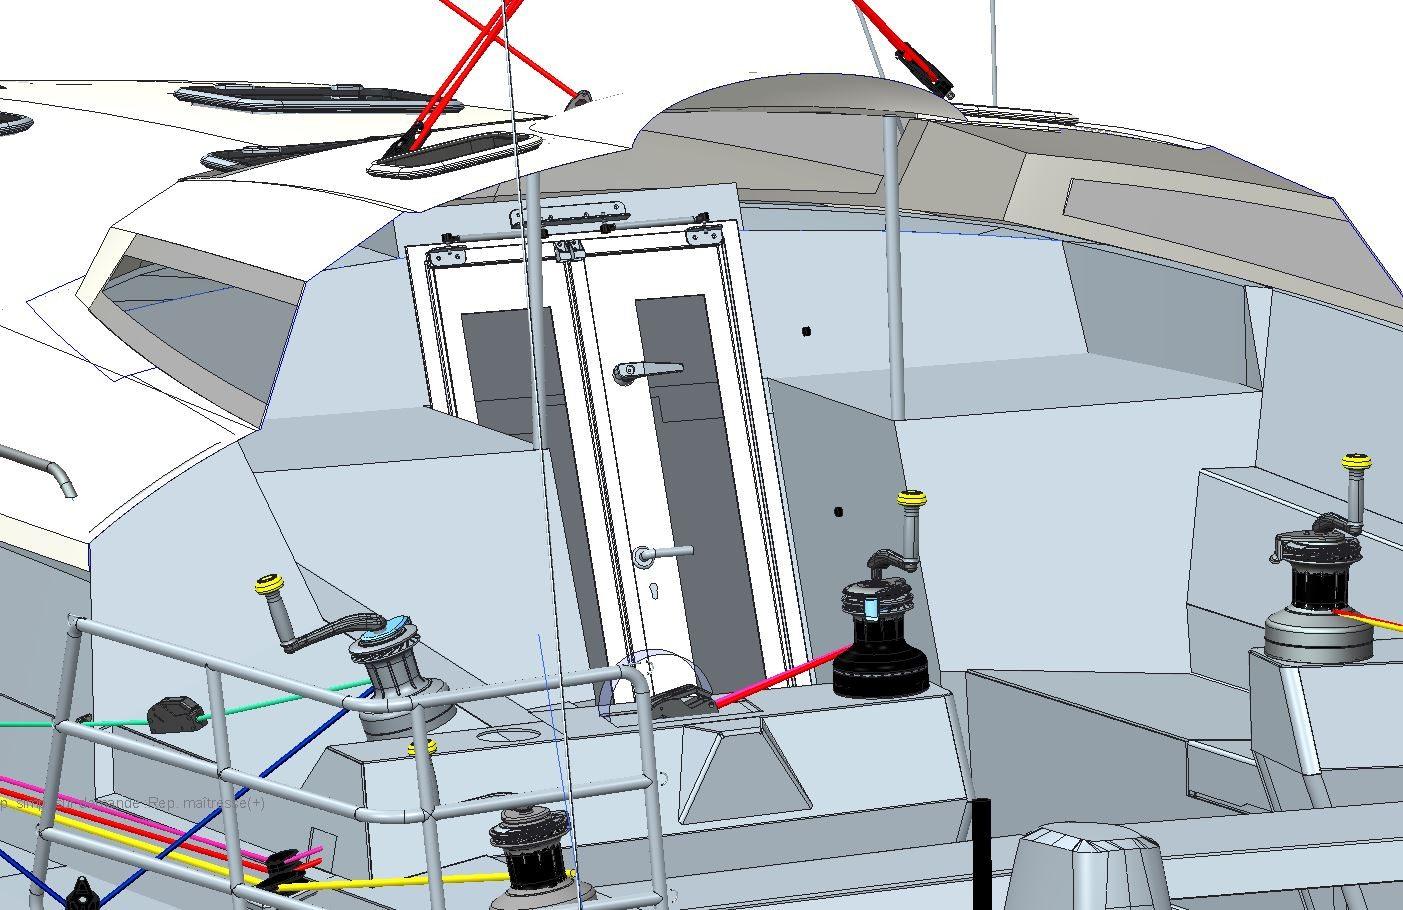 GE52 - Cockpit -detail1.JPG